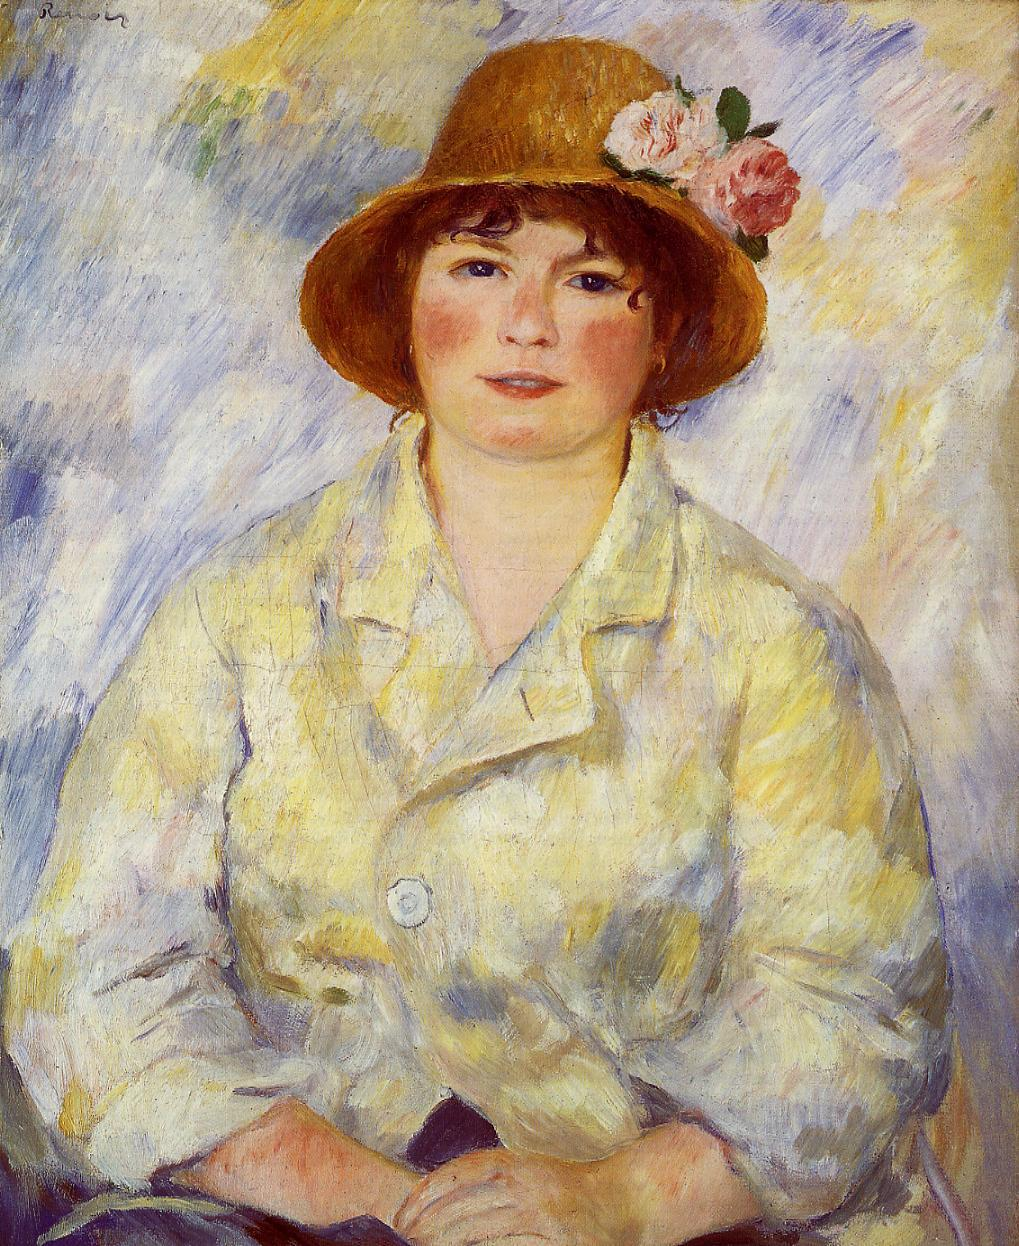 Pierre-Auguste_Renoir_Portrait_of_Madame_Renoir_(c._1885_small).jpg